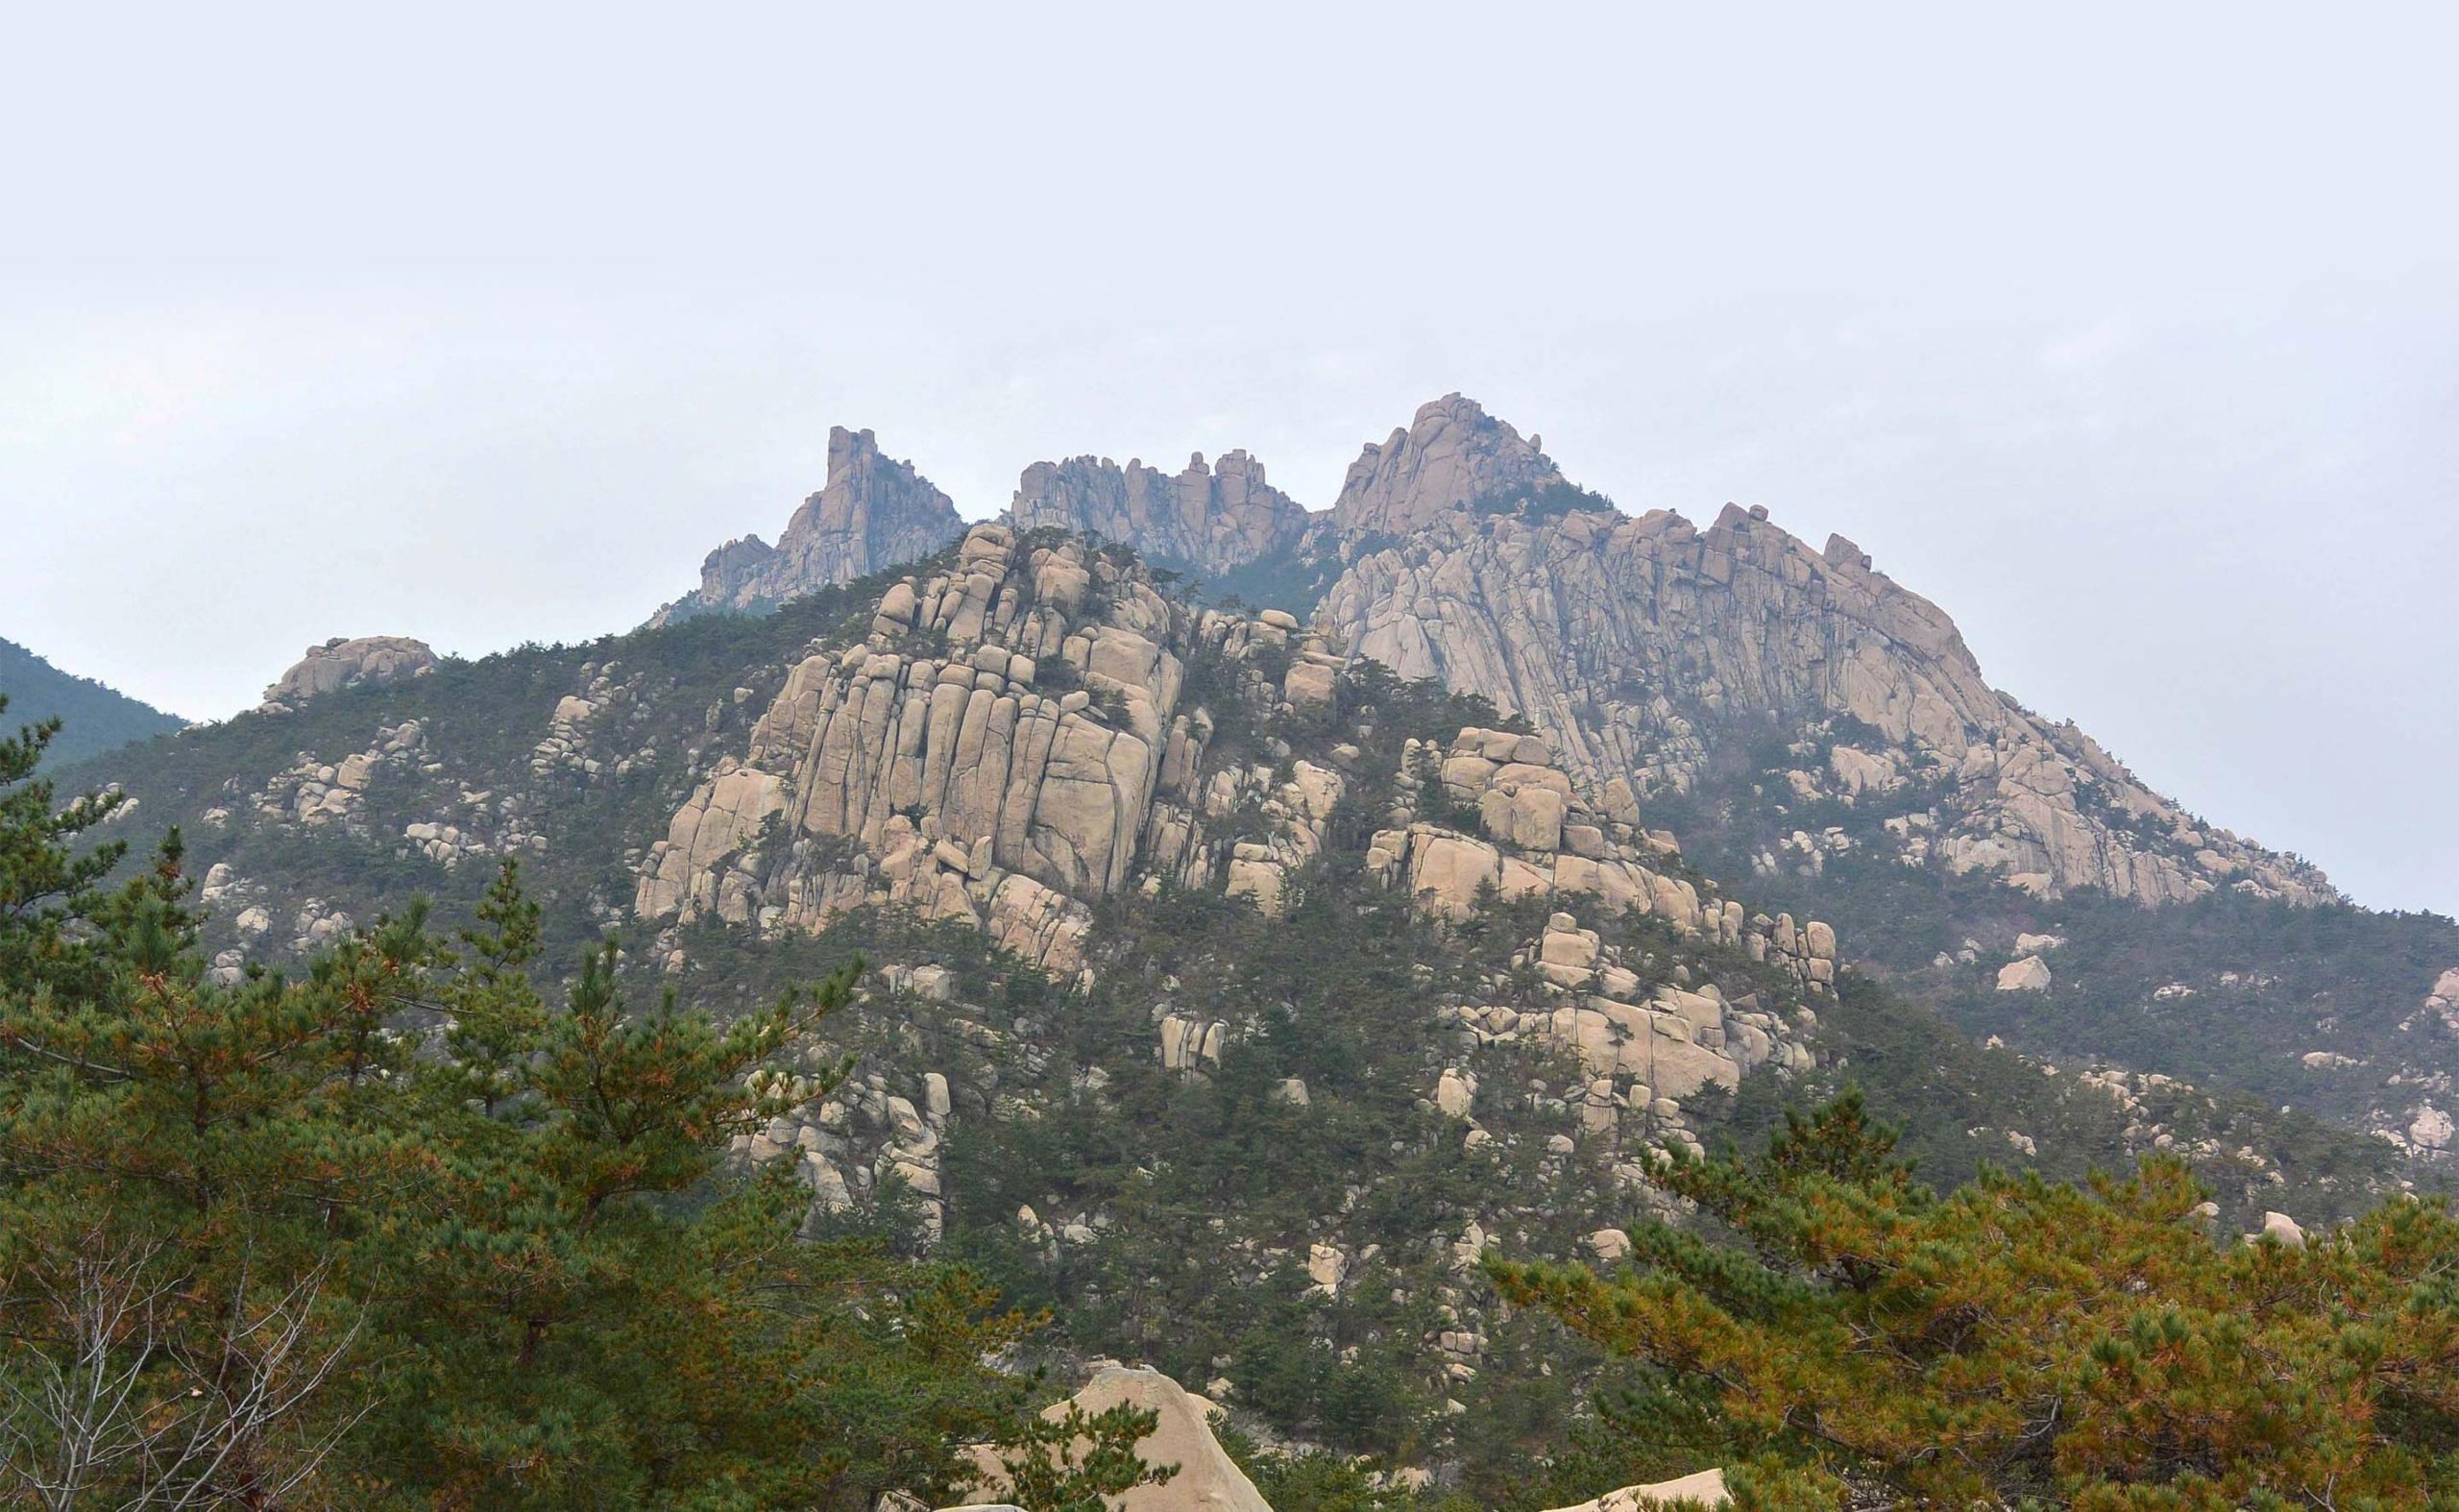 laoshan_erlong-peak-3067_largex2